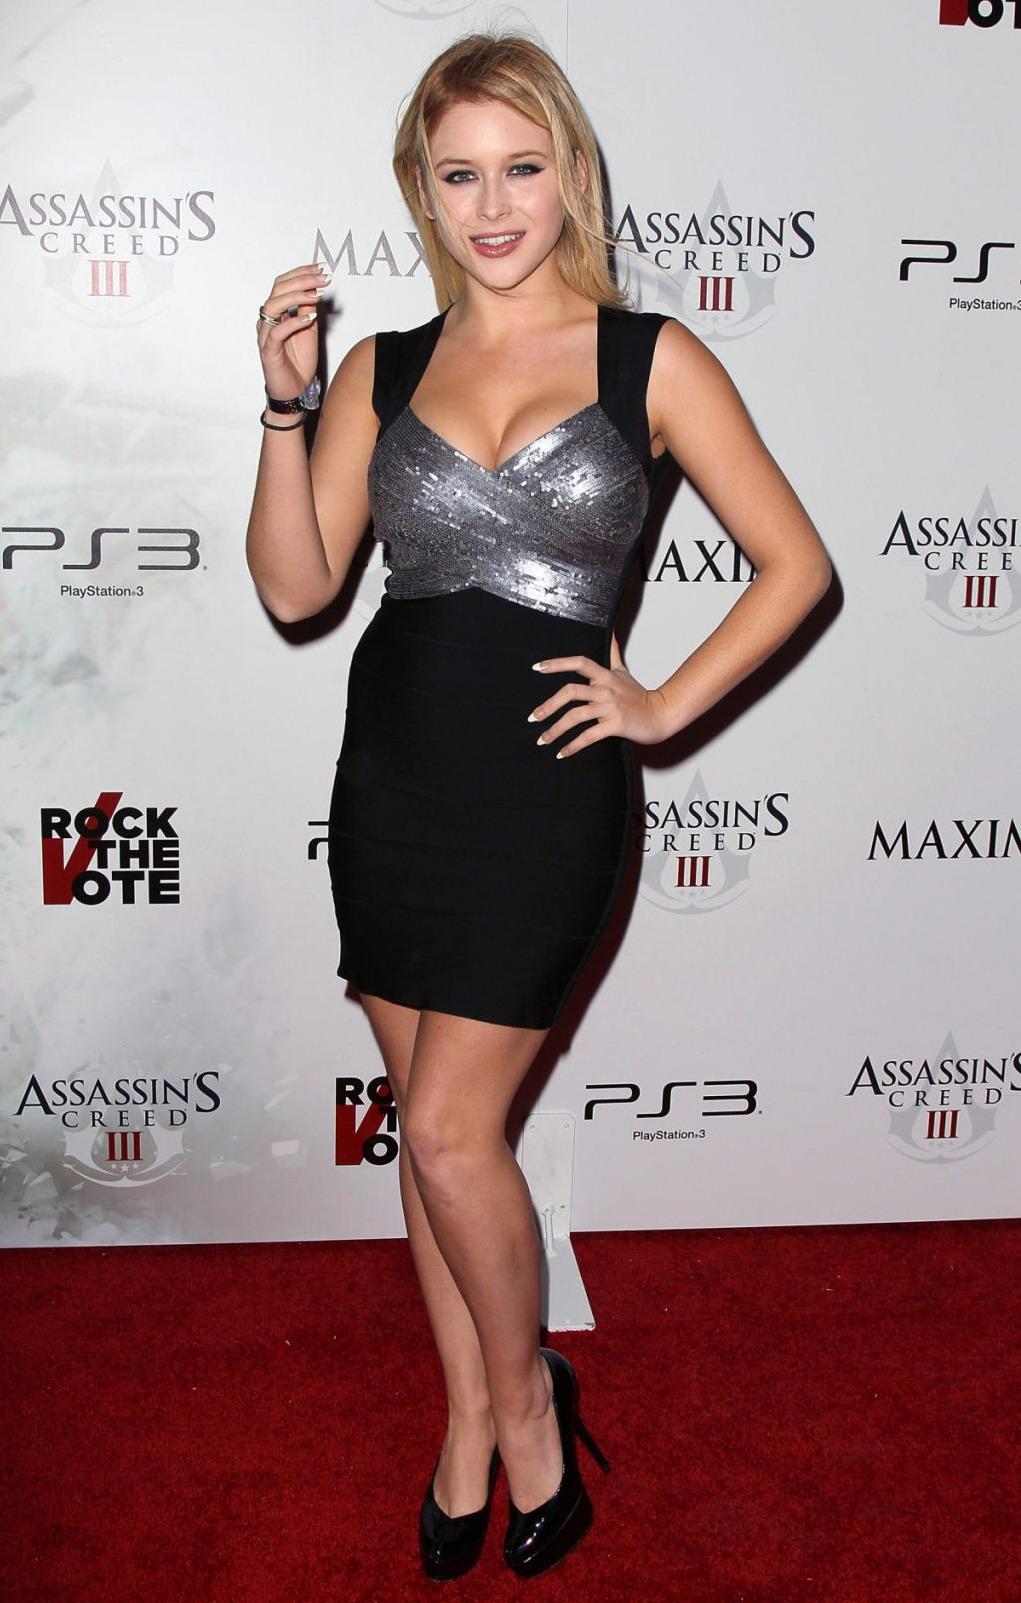 Renee Olstead Maxim Rock The Vote Party In LA GotCeleb